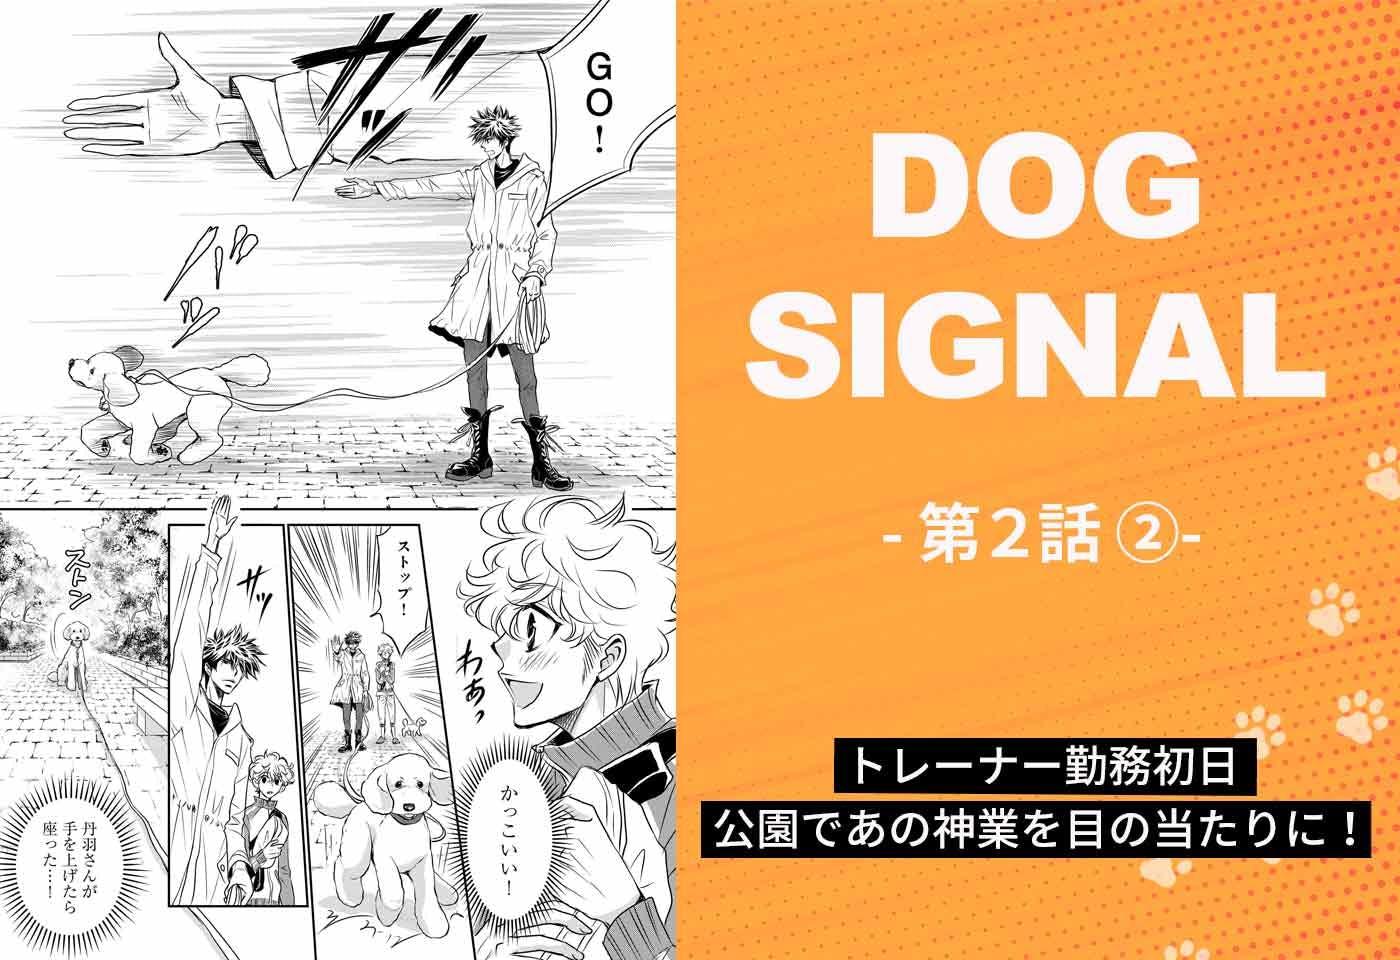 『DOG SIGNAL』2話目 2/4